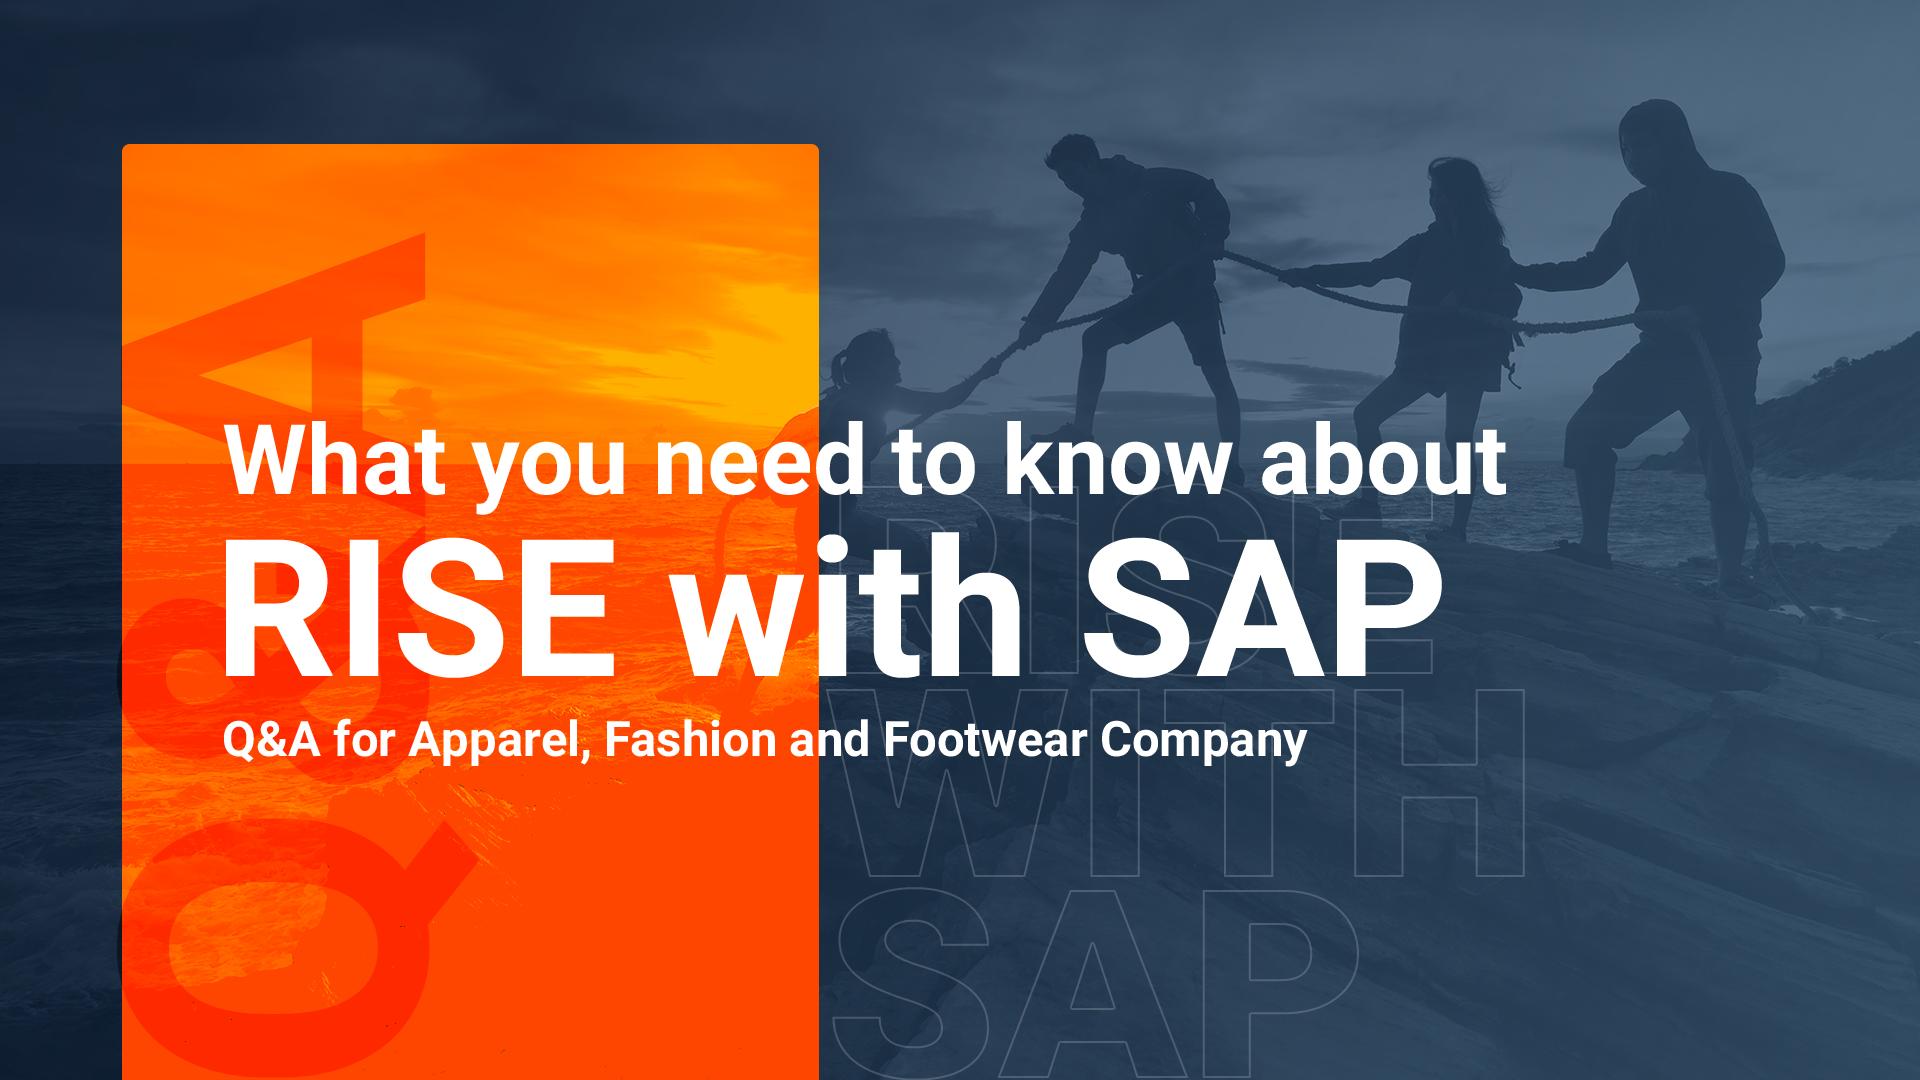 Rise with SAP webinar_BLOG COVER copy